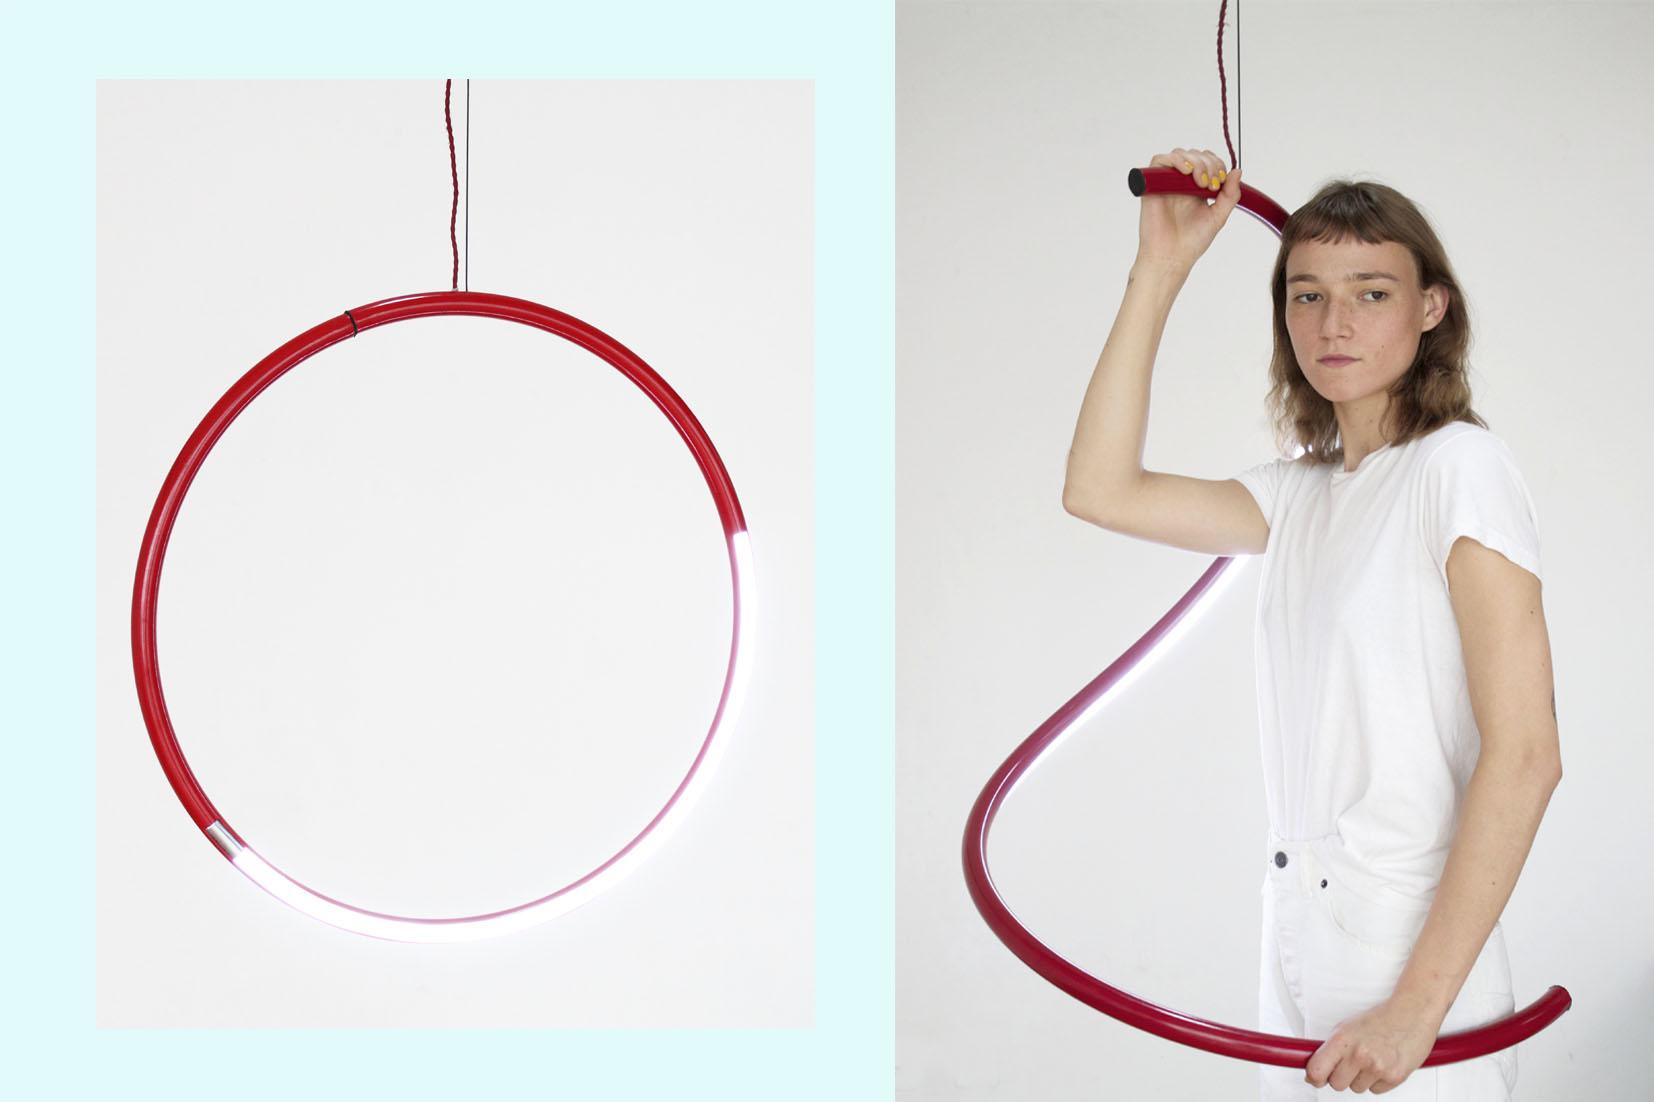 Helik light by sophia - Creative Work - $i